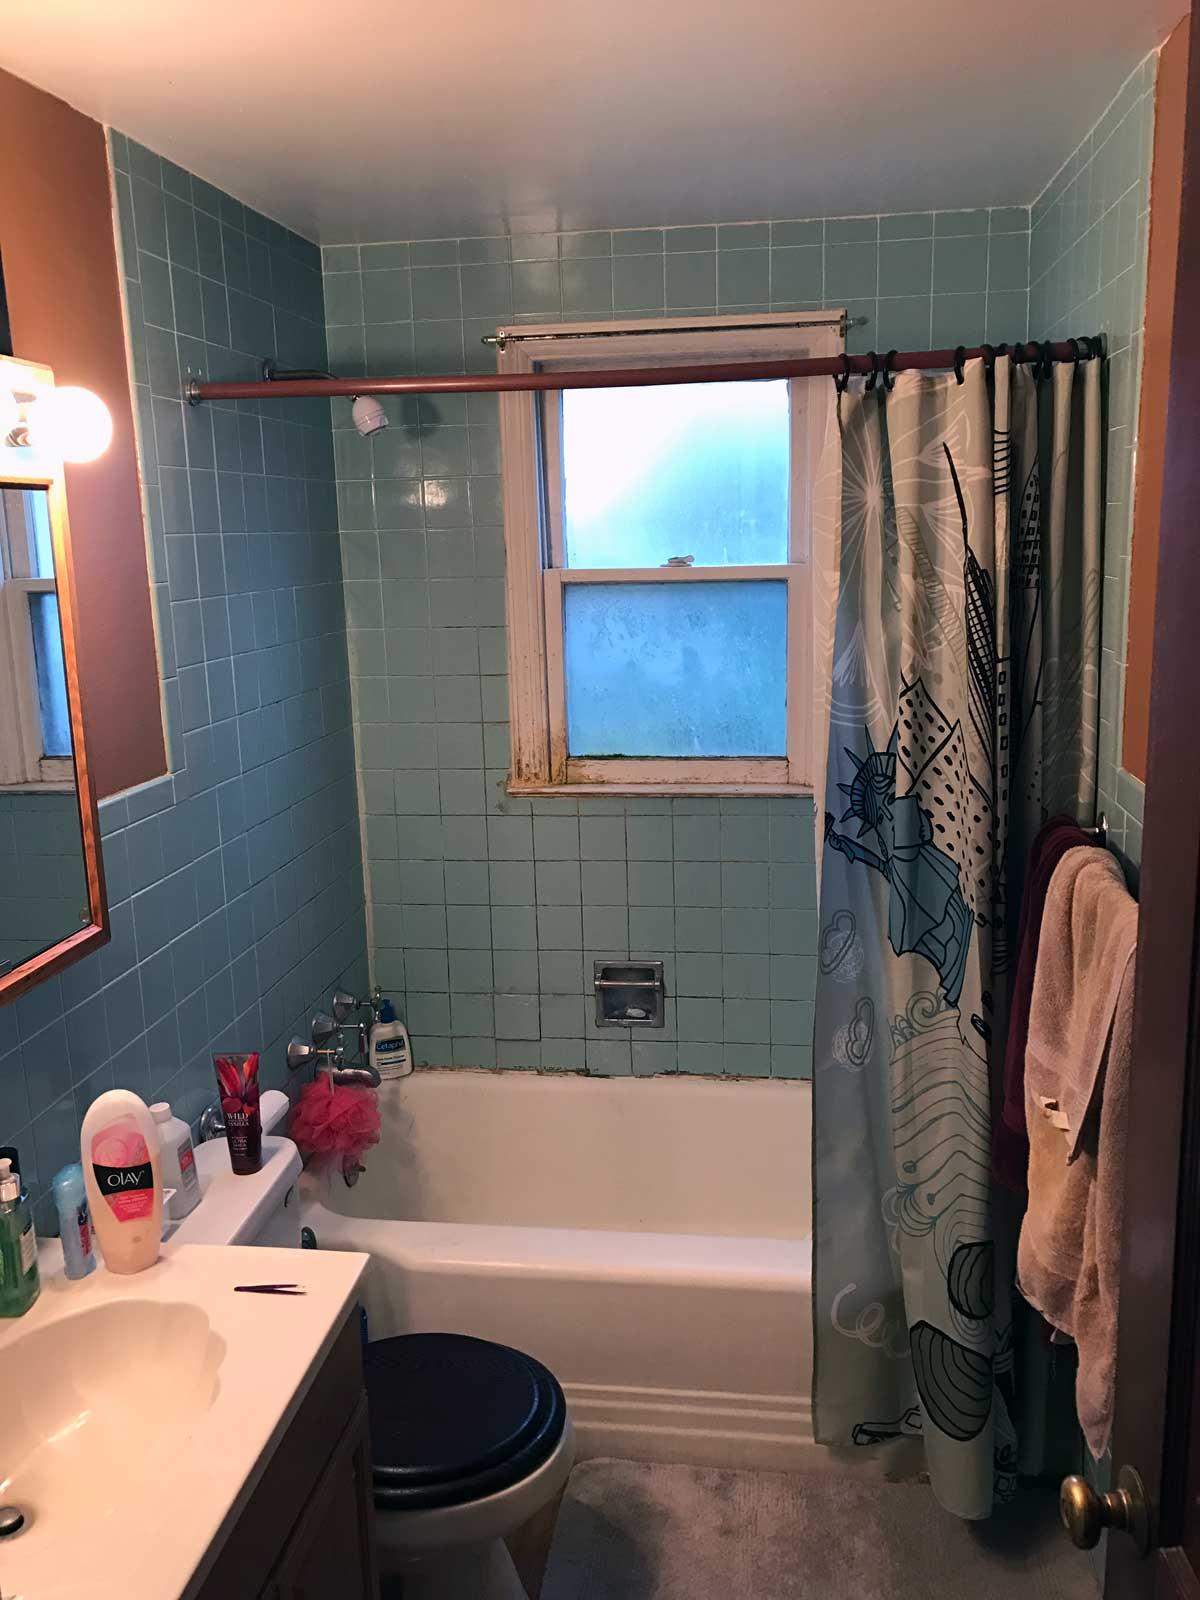 15-Day-Bathroom-Renovation-01.jpg